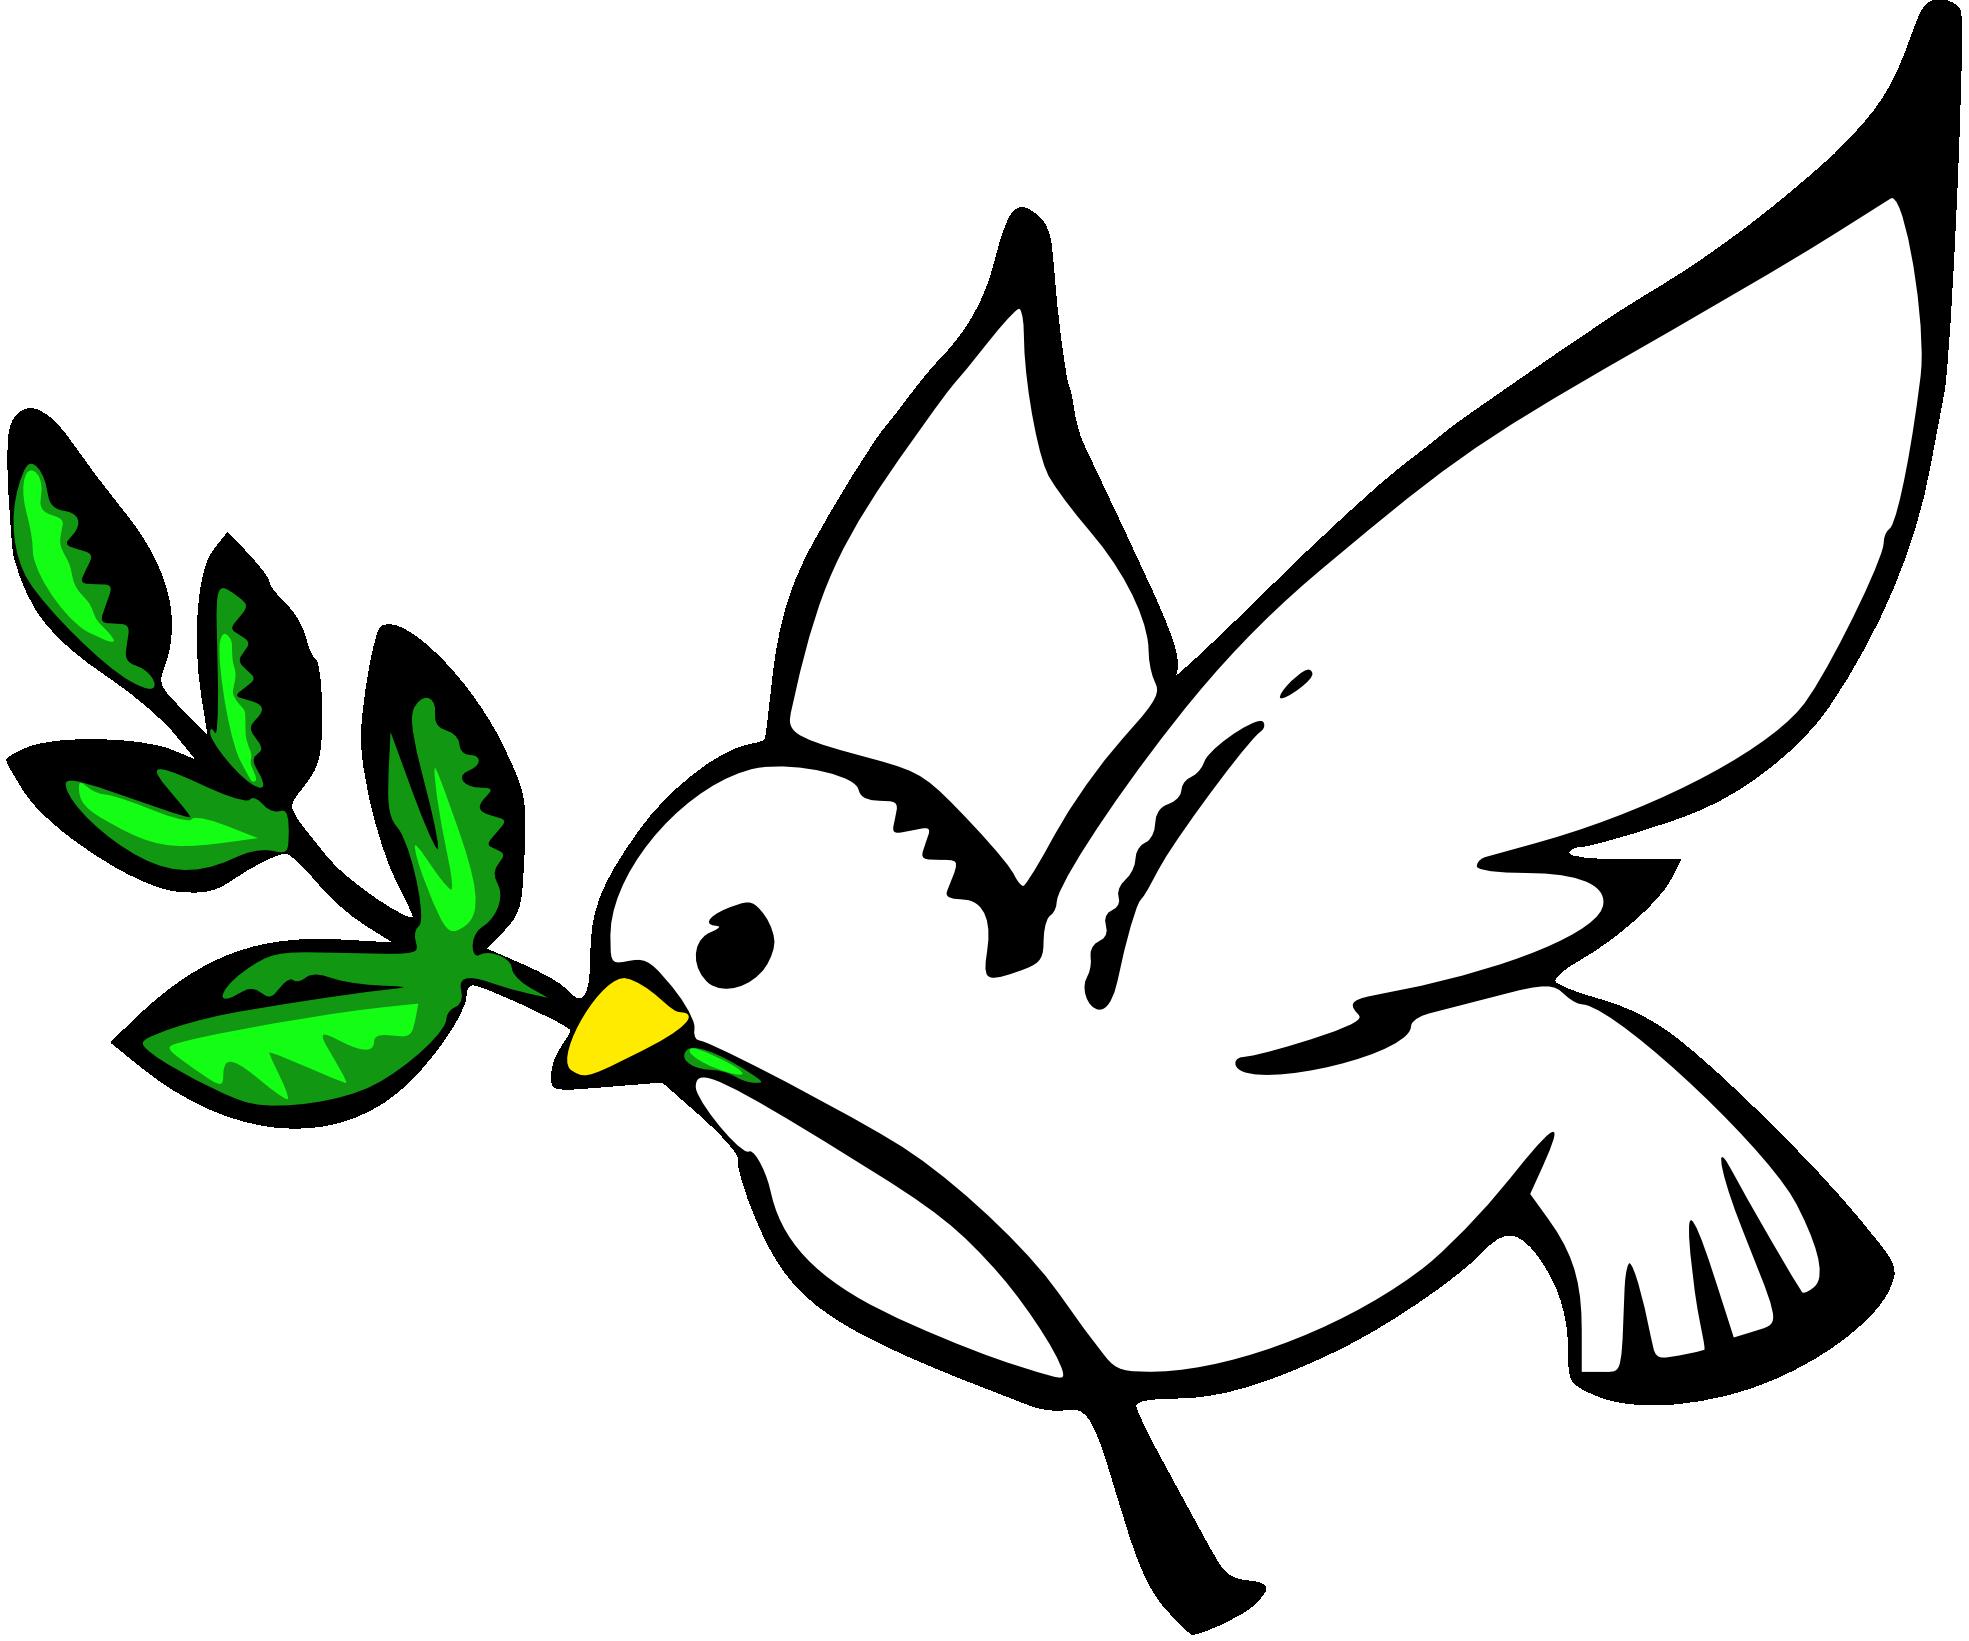 1969x1641 Dove Clipart Transparent No Background Free 4